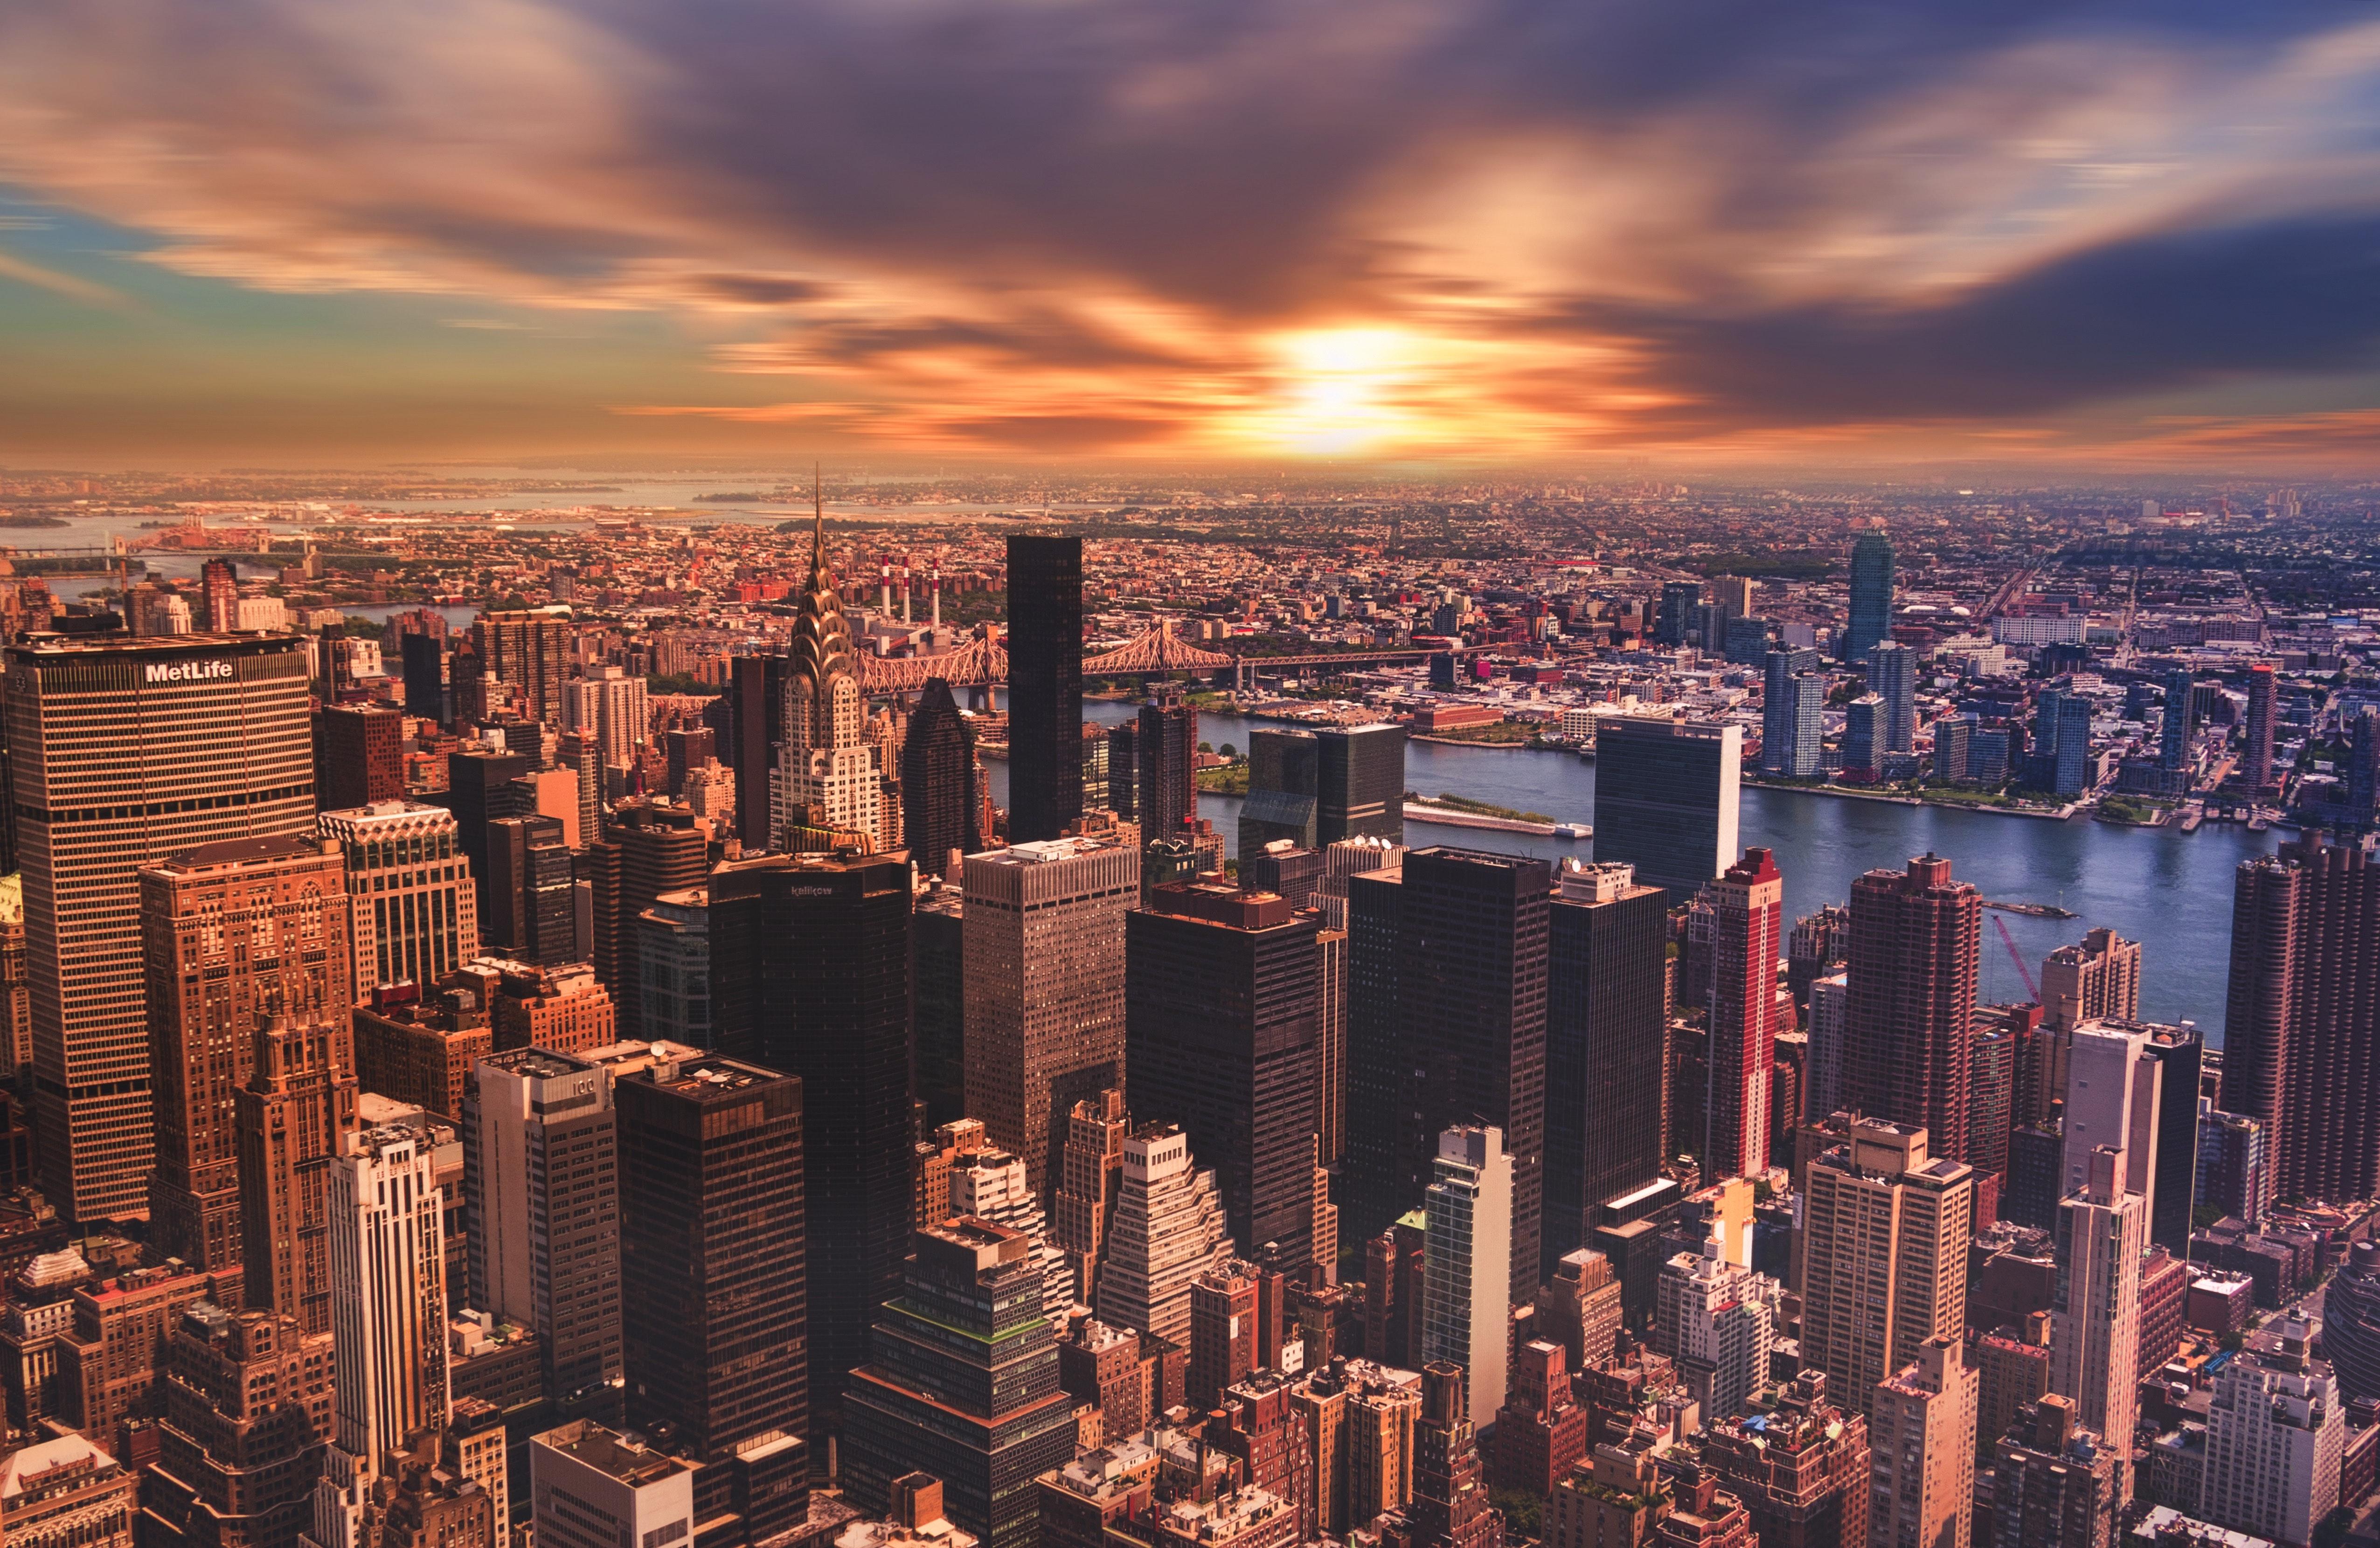 New York City Wallpaper · Pexels · Kostenlose Stock Fotos